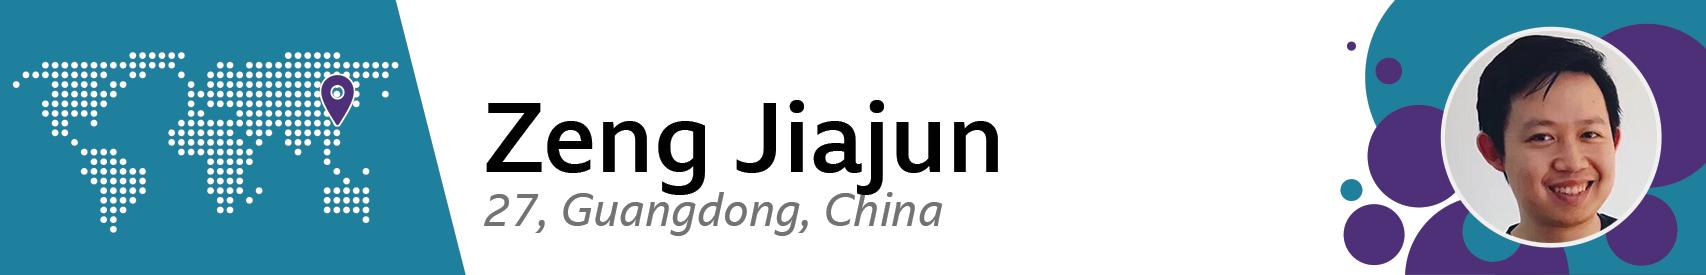 Zeng Jiajun